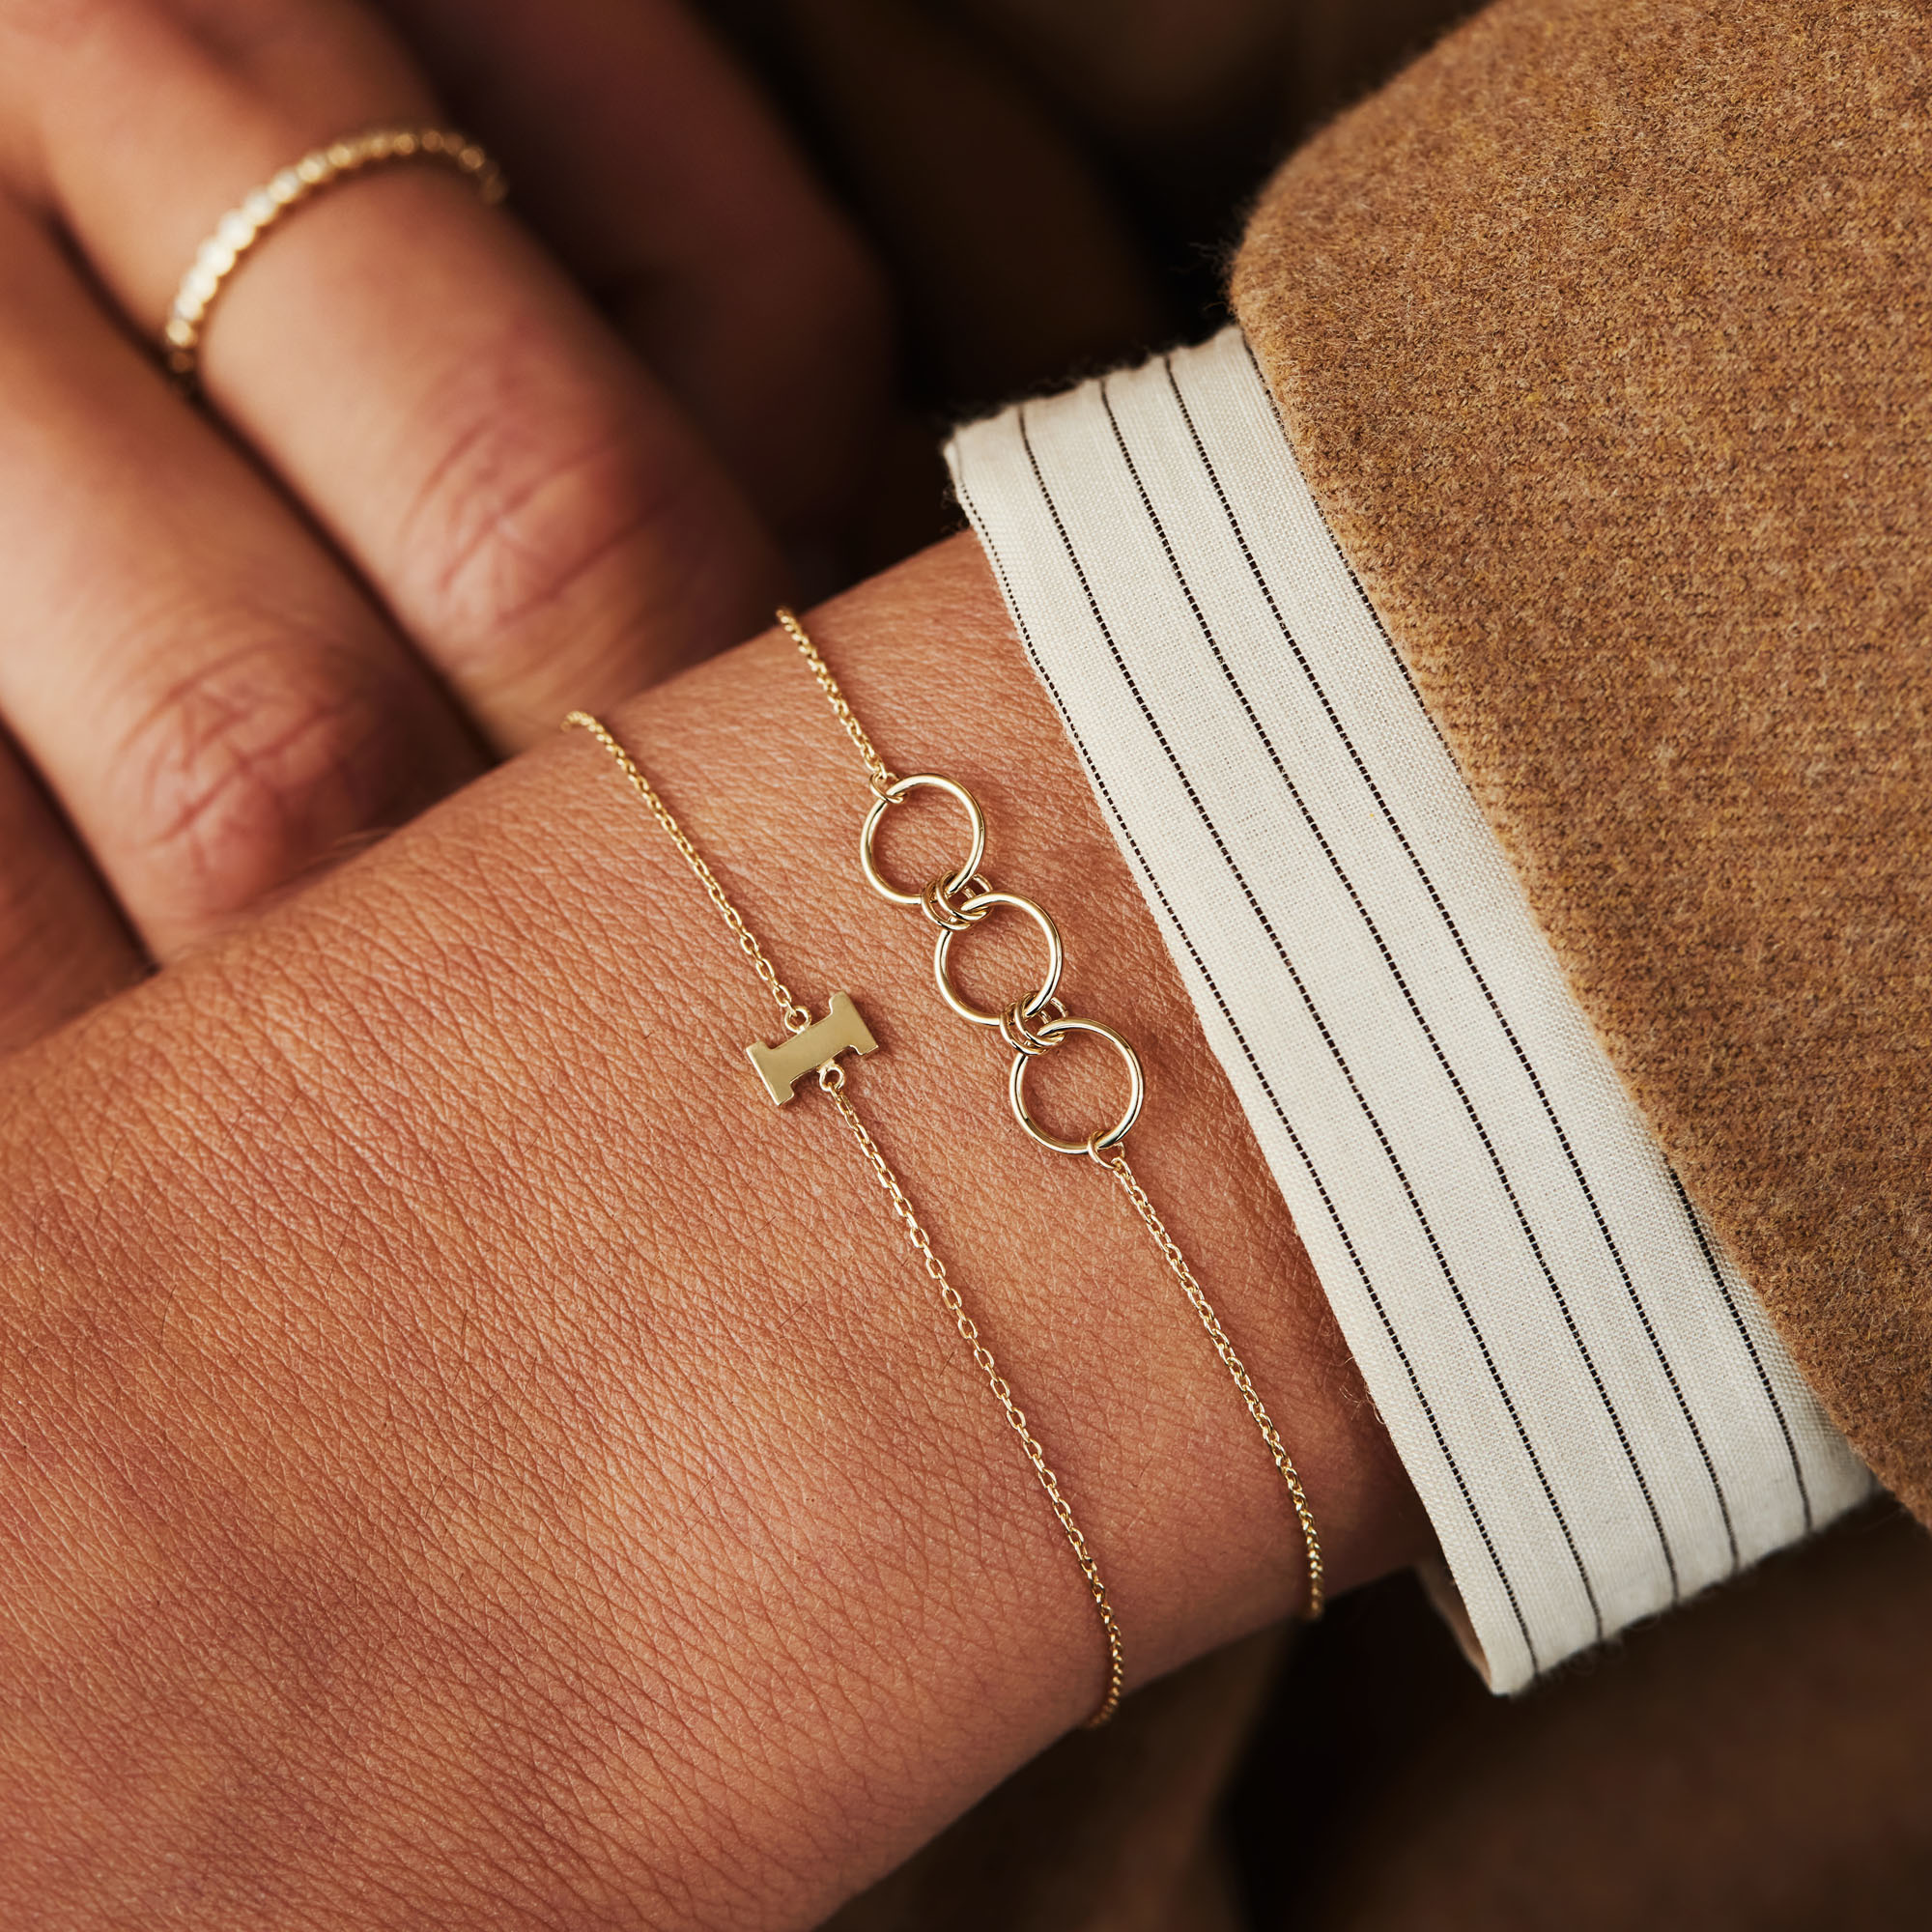 Isabel Bernard Belleville Anna 14 karaat gouden armband met rondjes